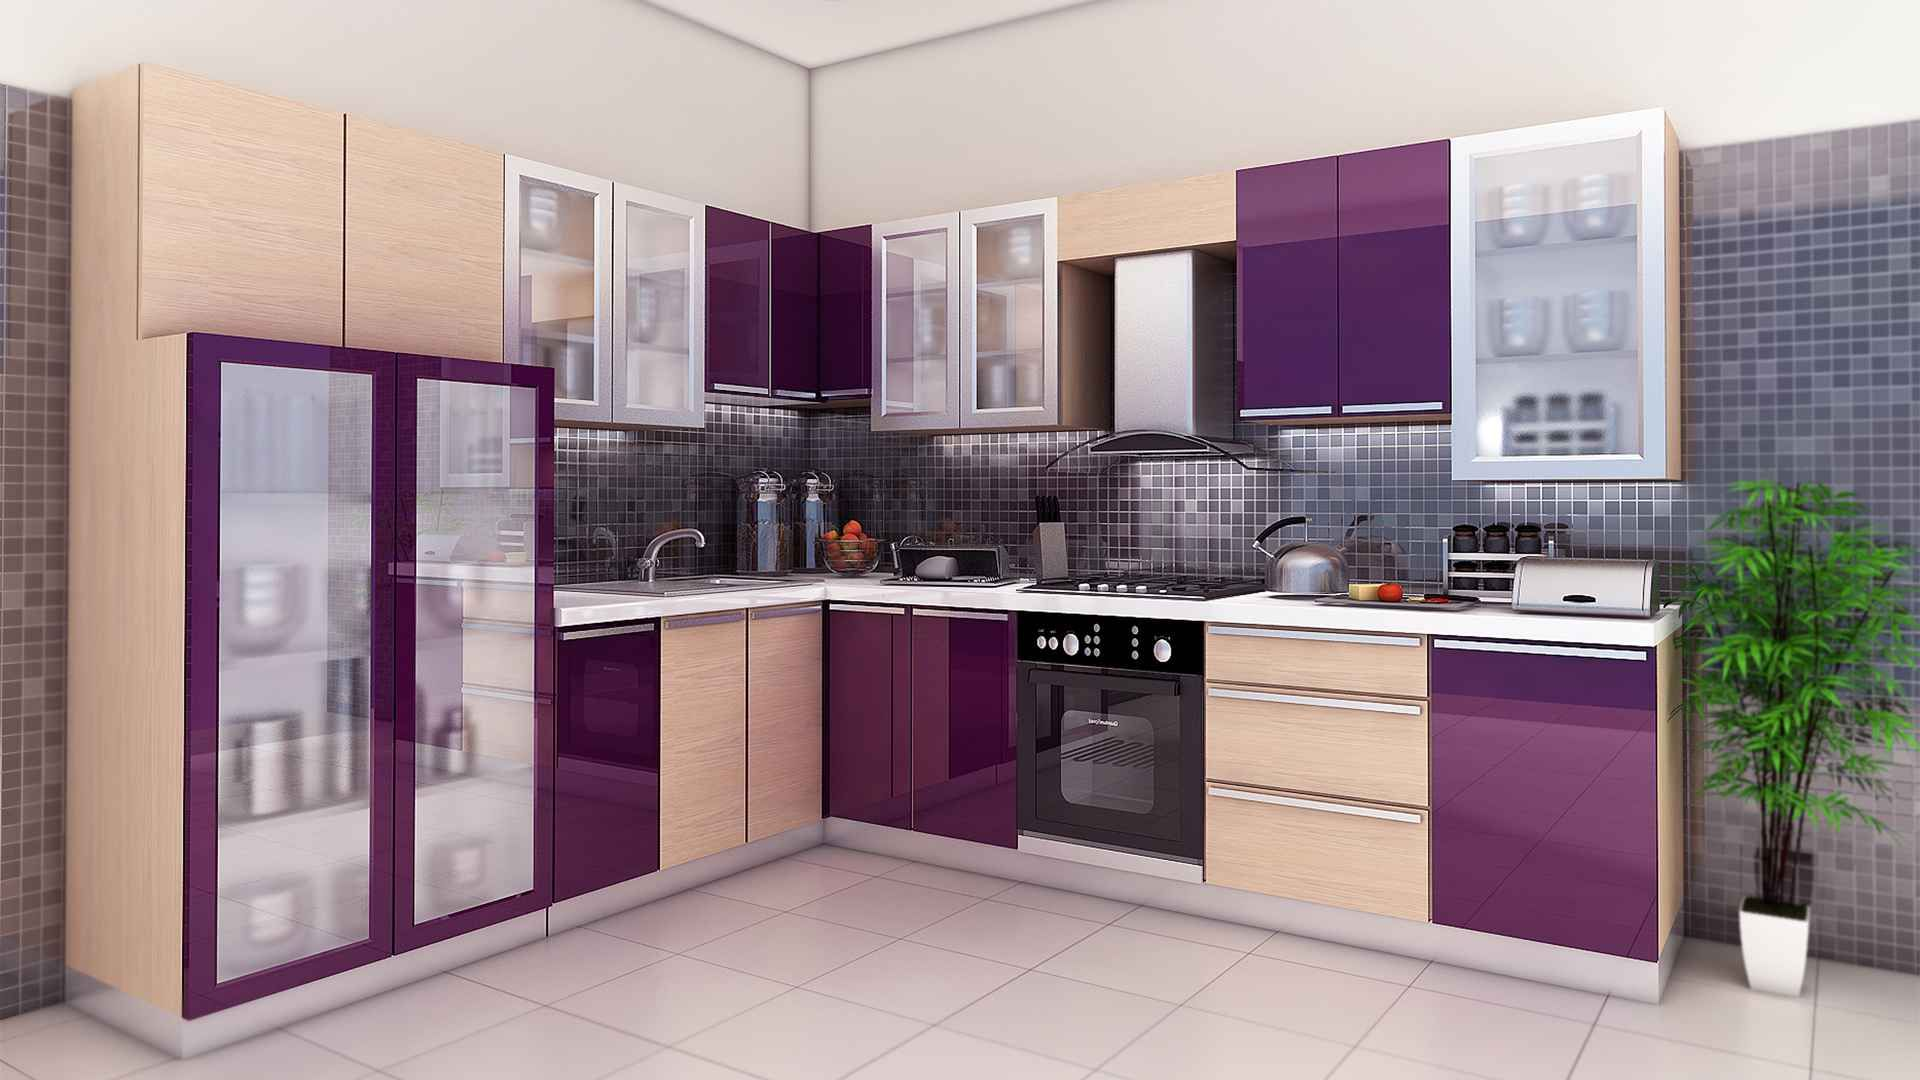 Small Violet Kitchen Renovation Kitchen Design Ideas All kitchen